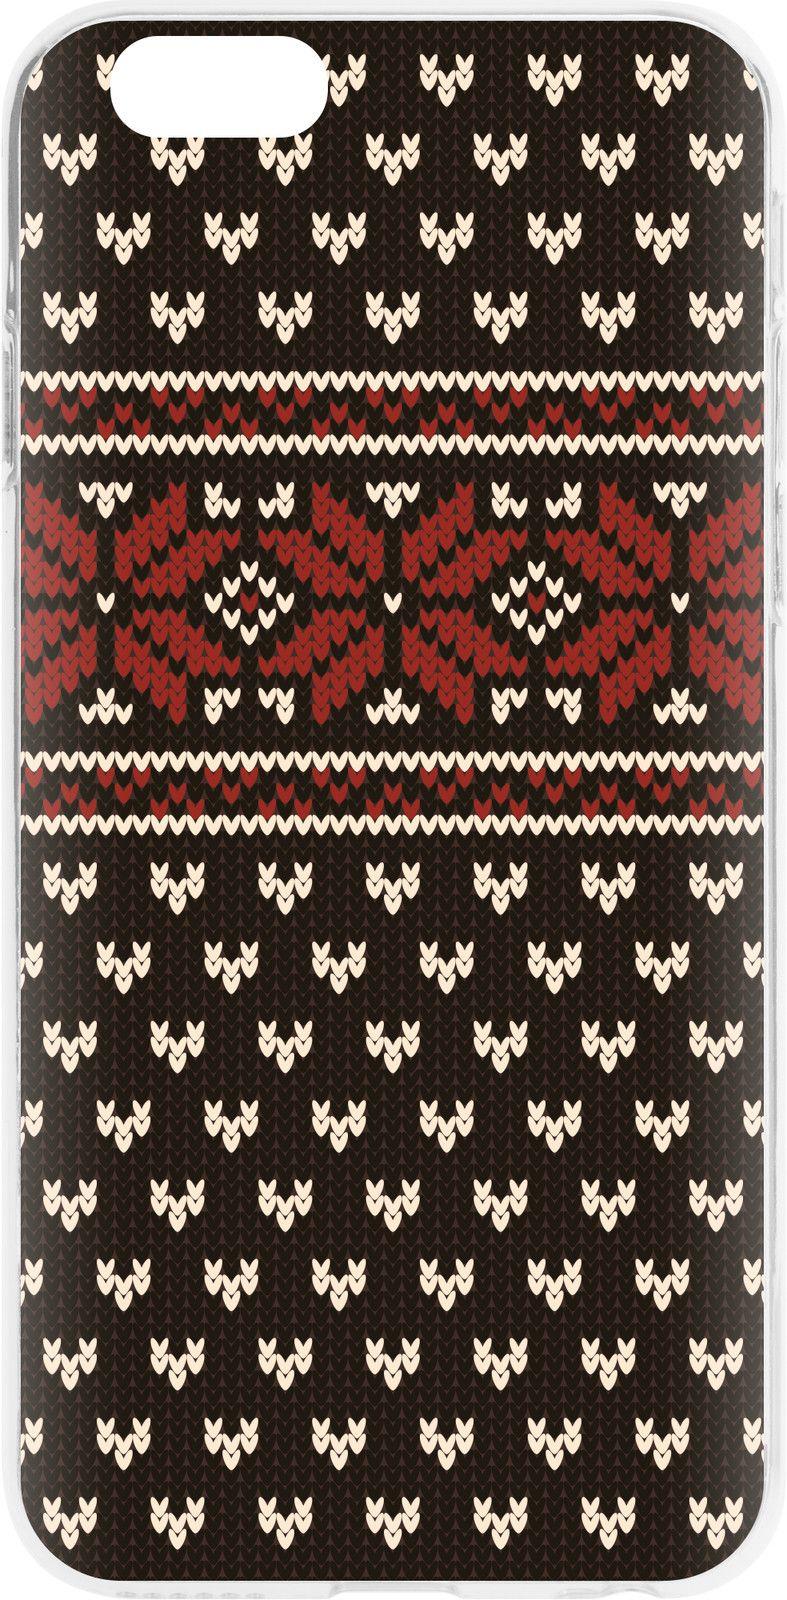 Flavr Xmas Holiday Sweater